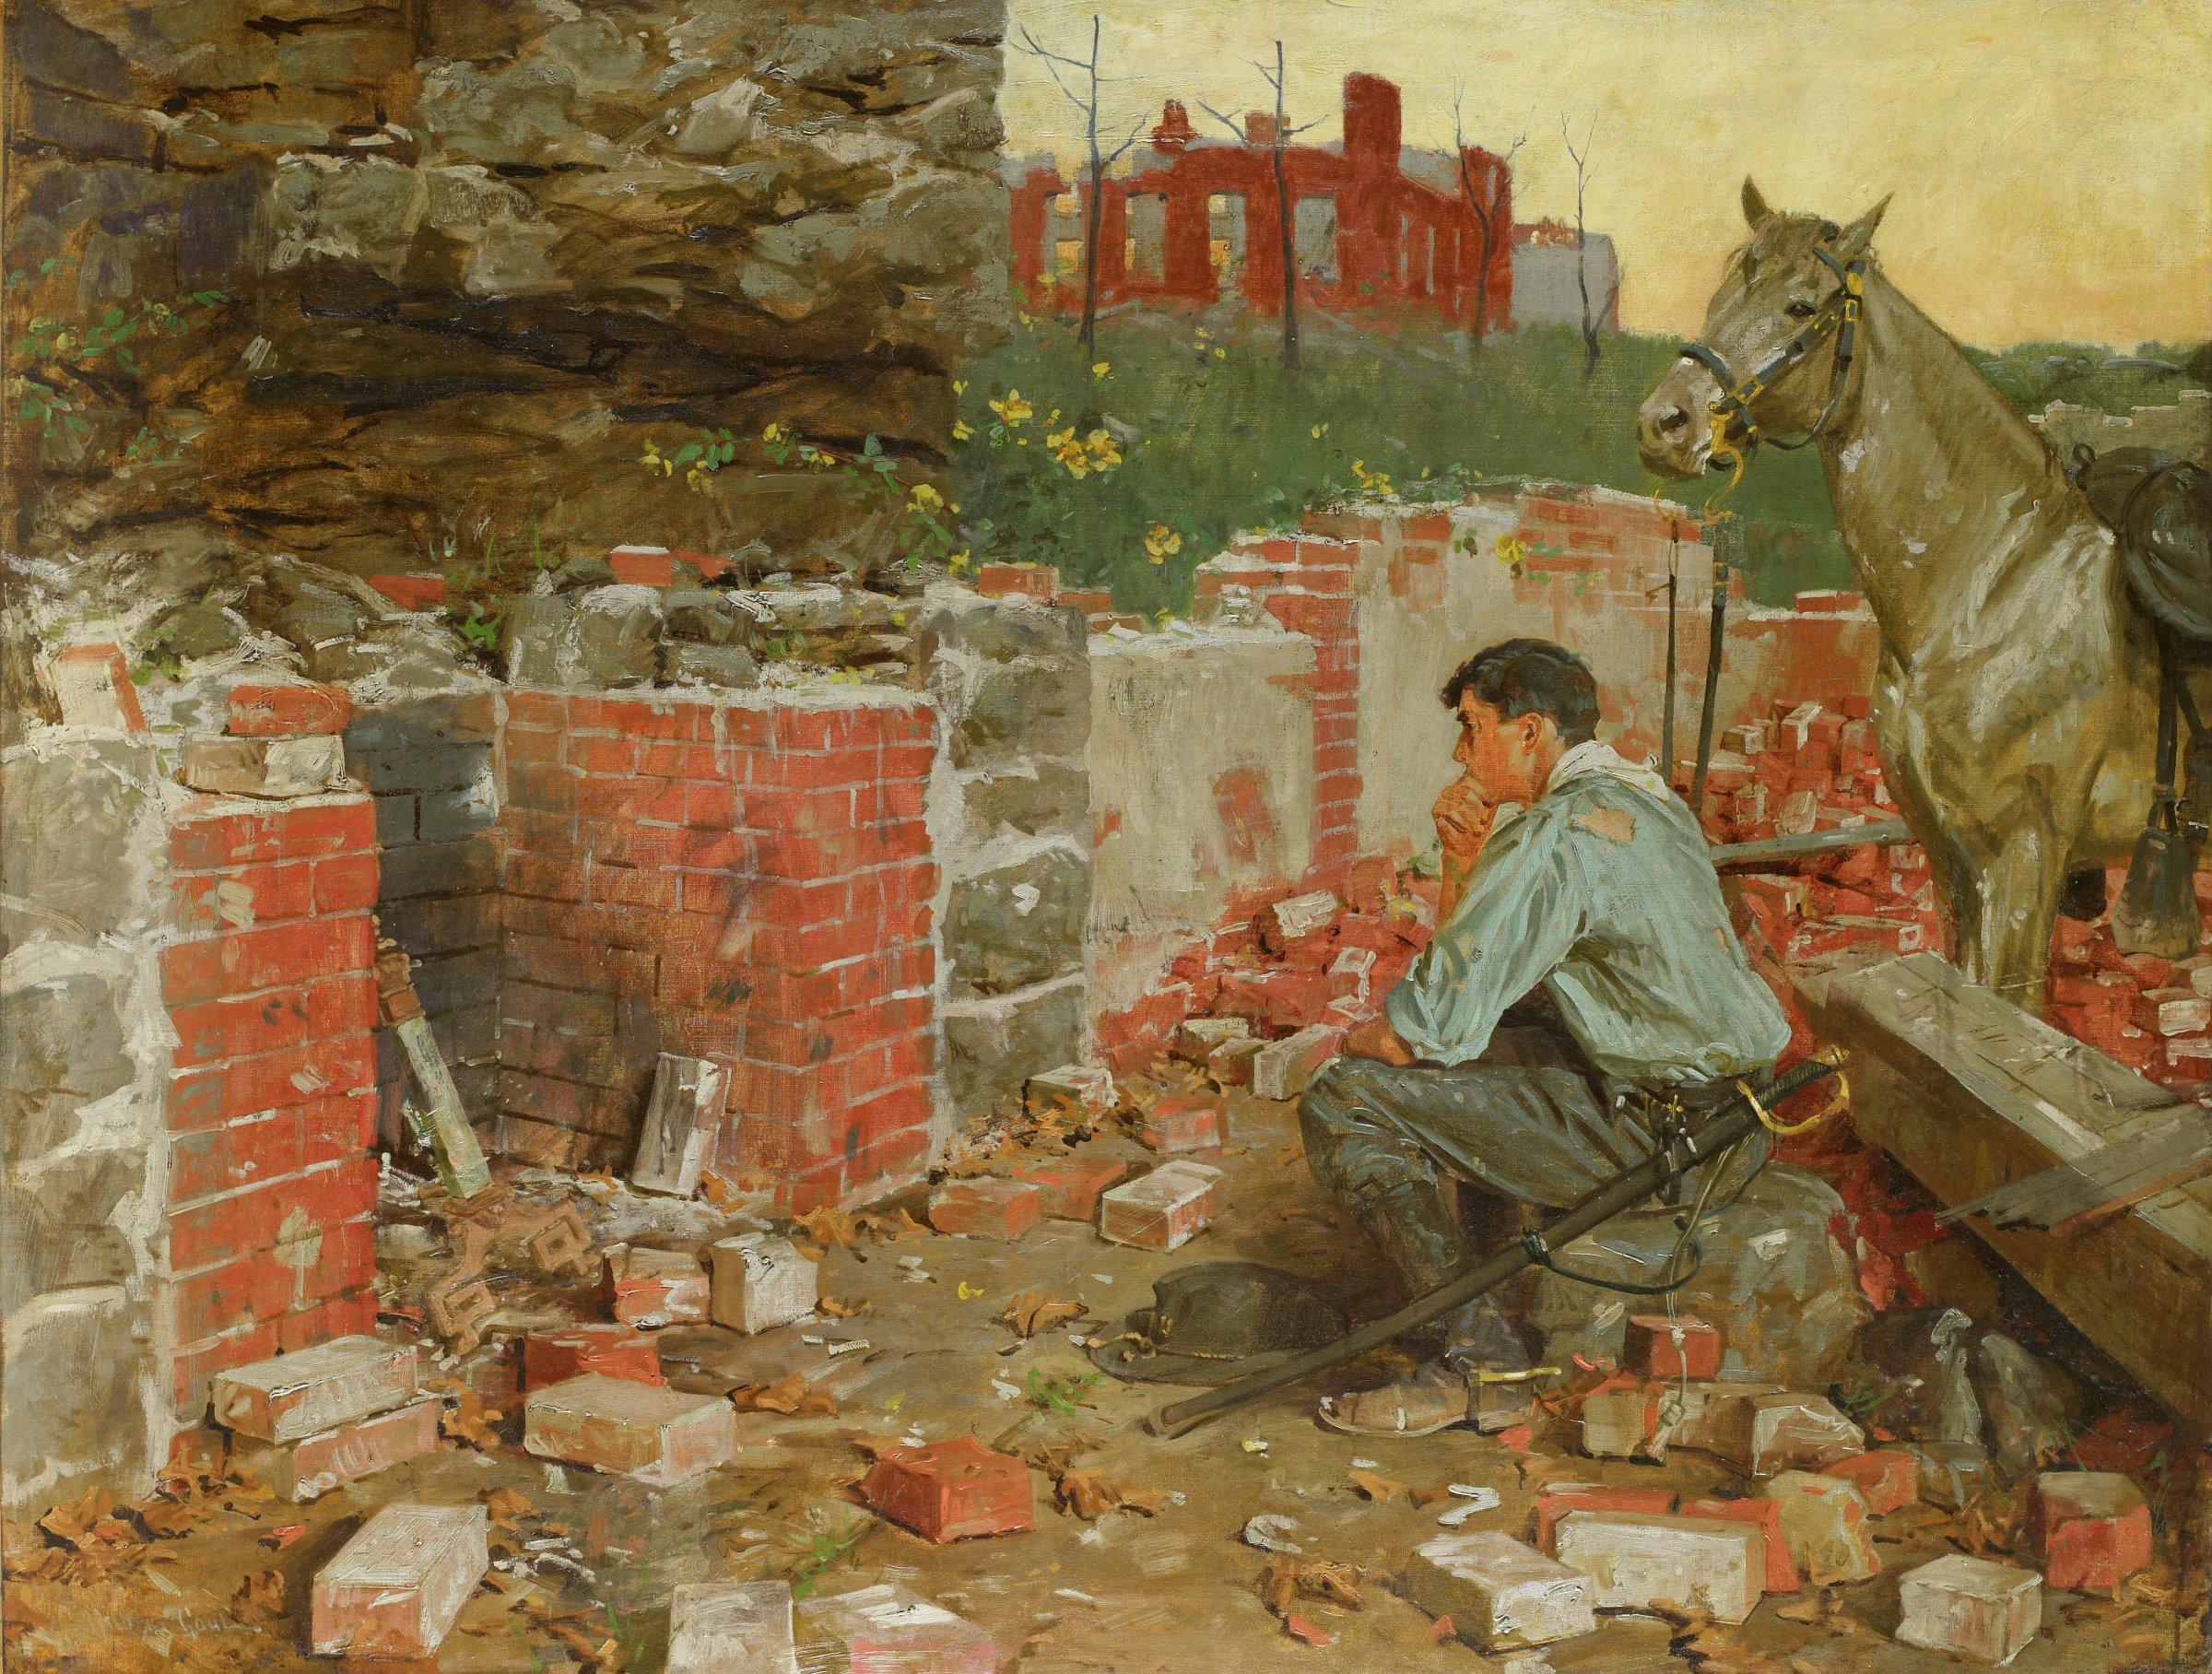 Return Home, William Gilbert Gaul, oil on canvas